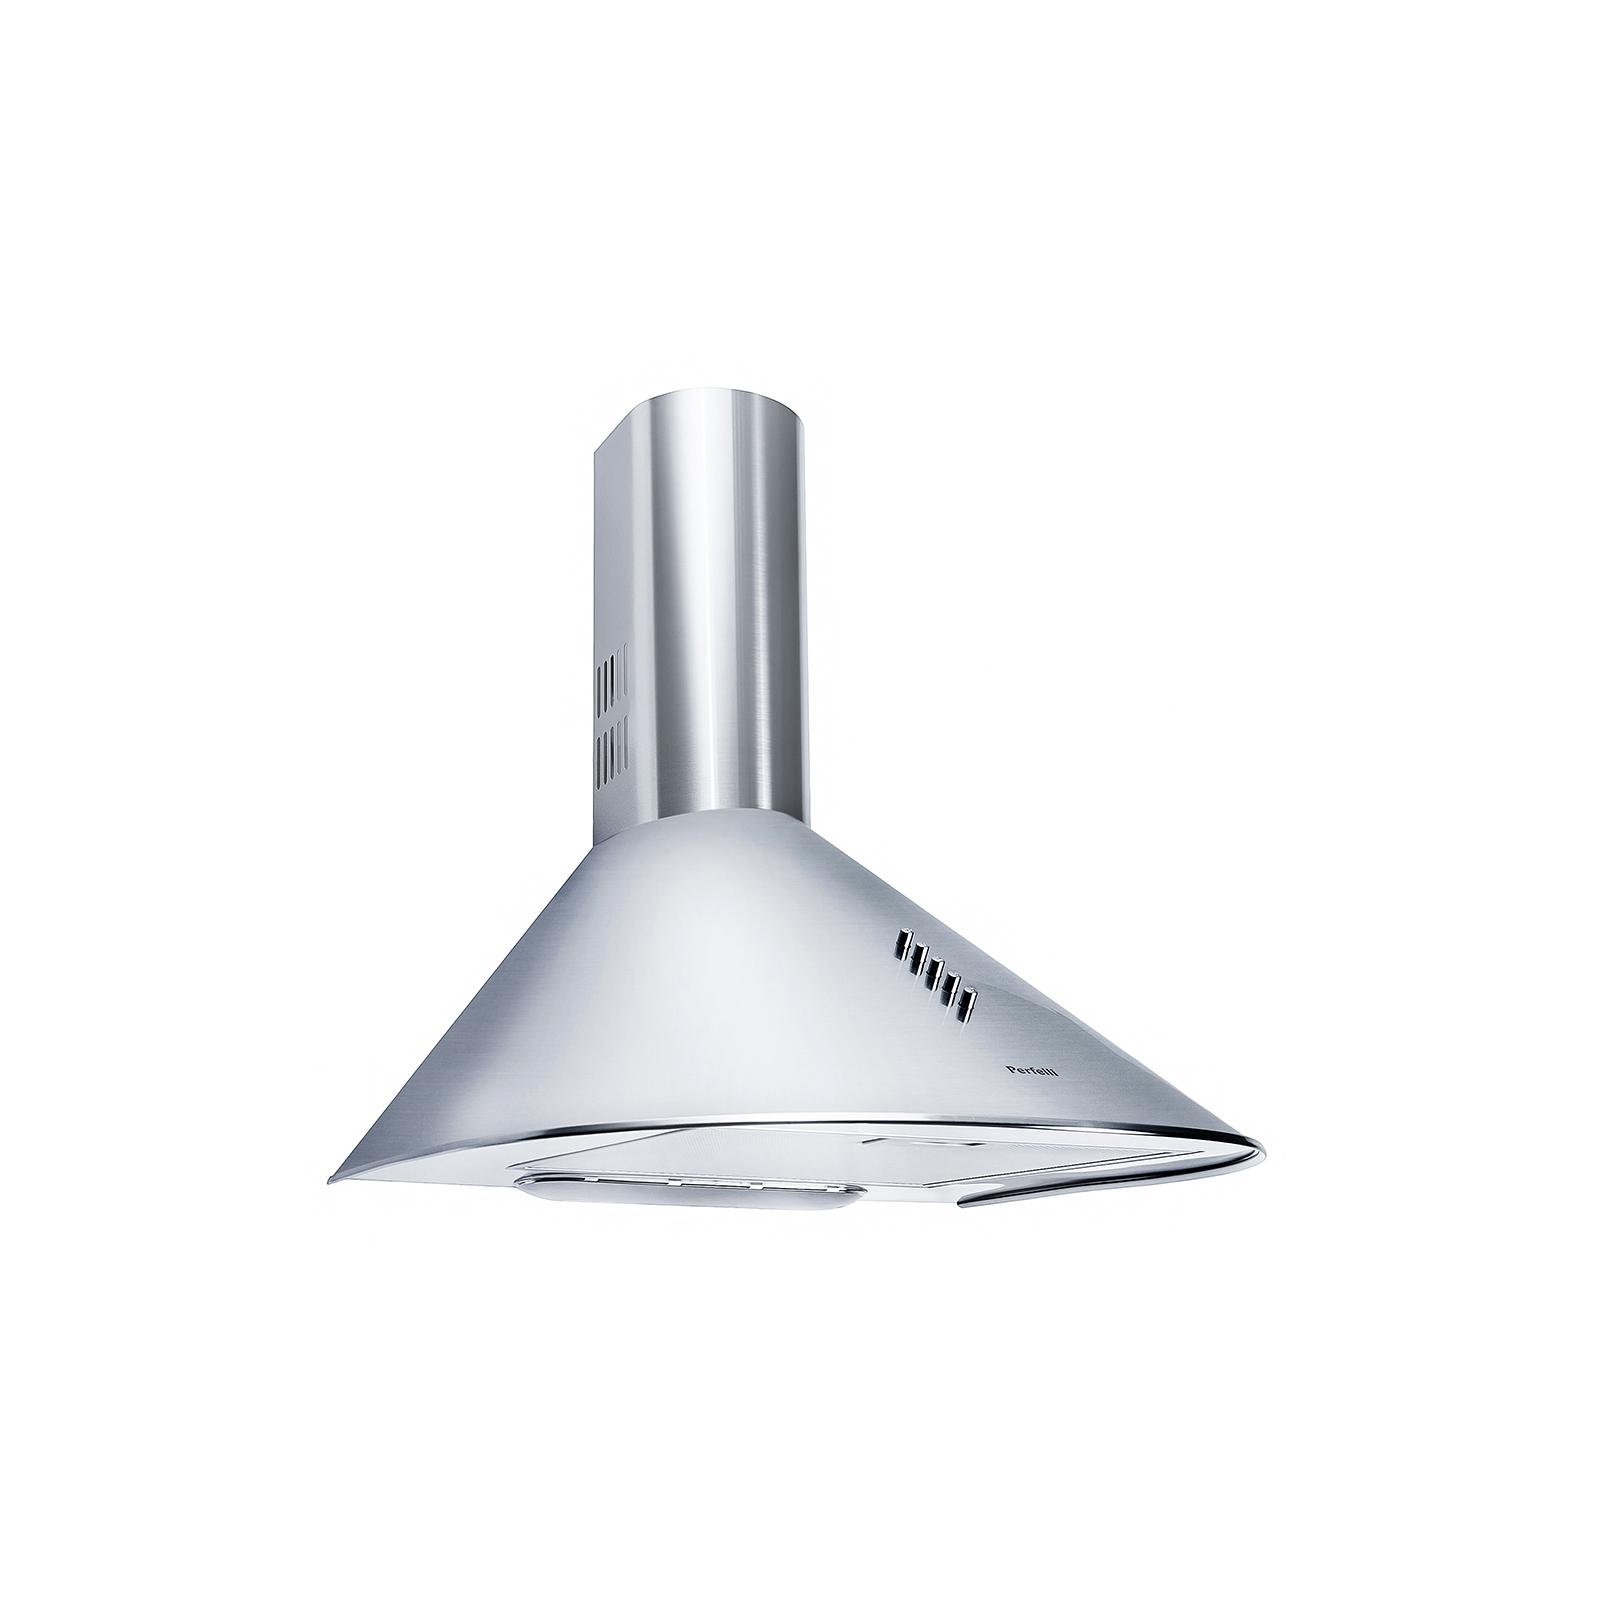 Вытяжка кухонная PERFELLI KR 6410 I